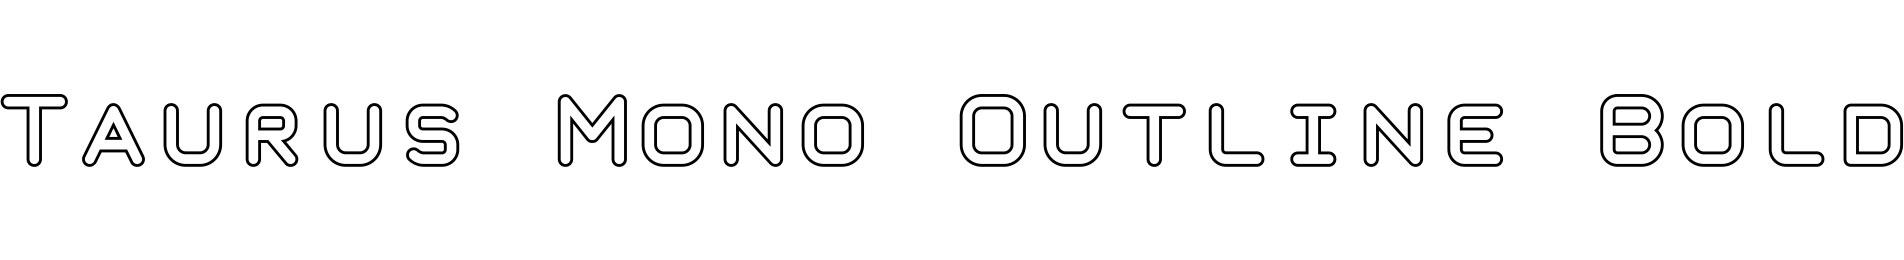 Taurus Mono Outline Bold